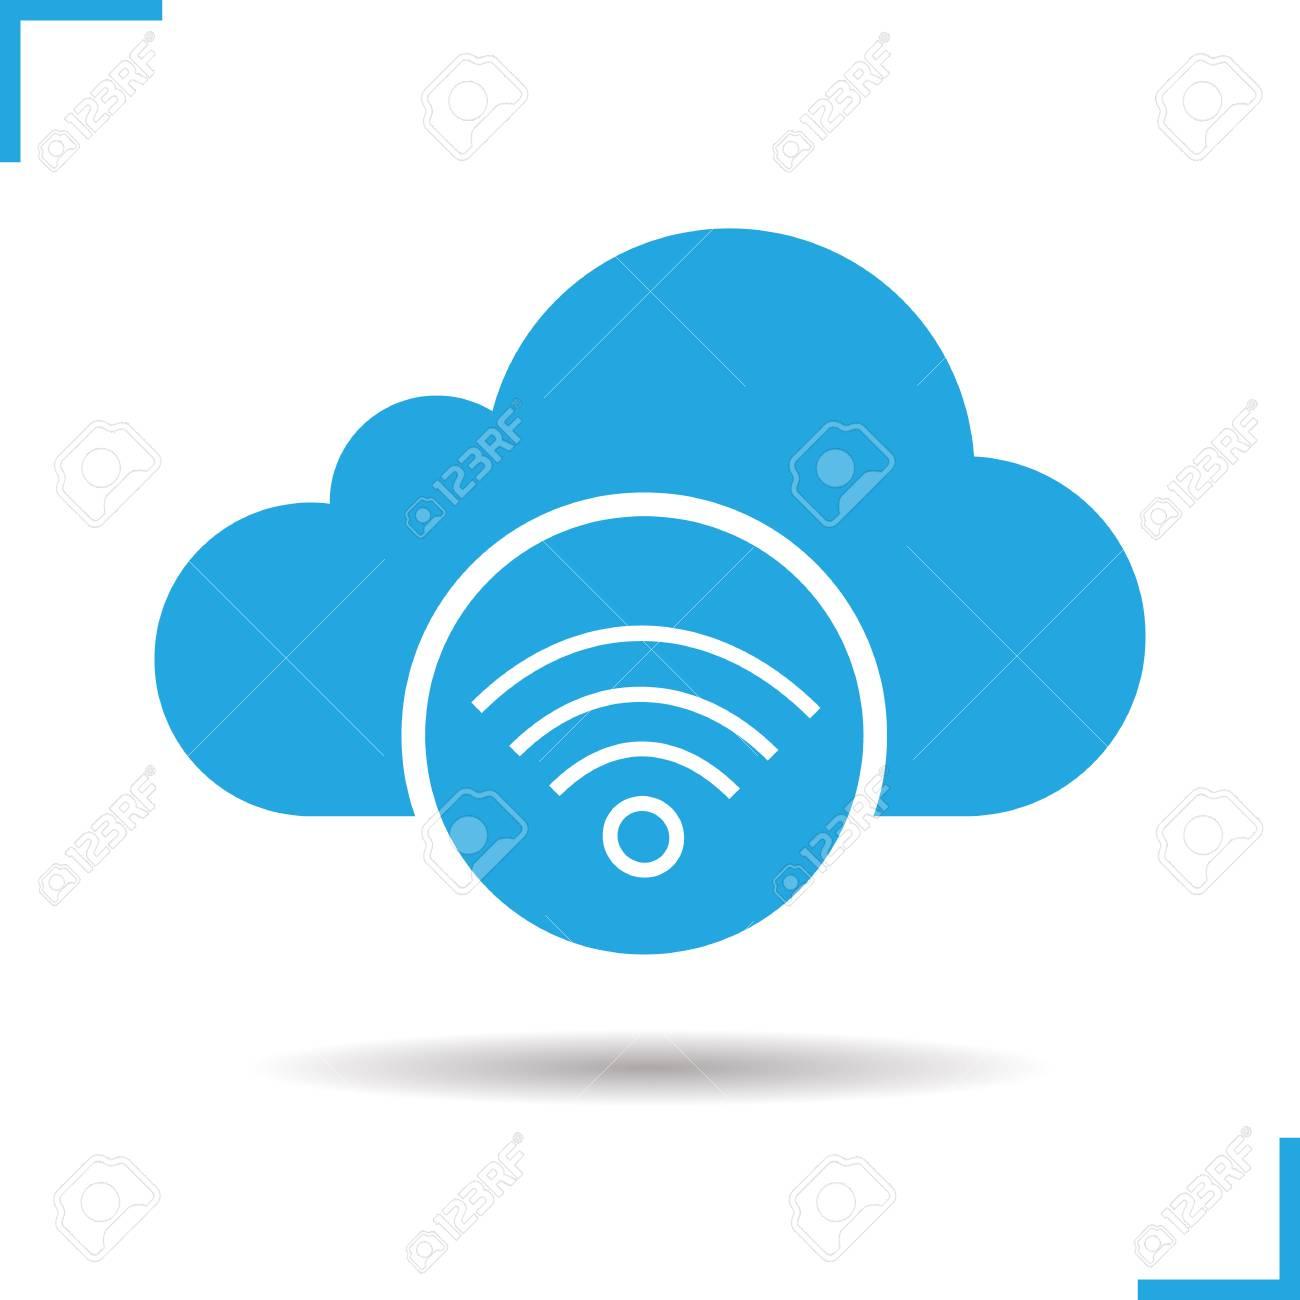 cloud computing wifi connection icon drop shadow silhouette rh 123rf com